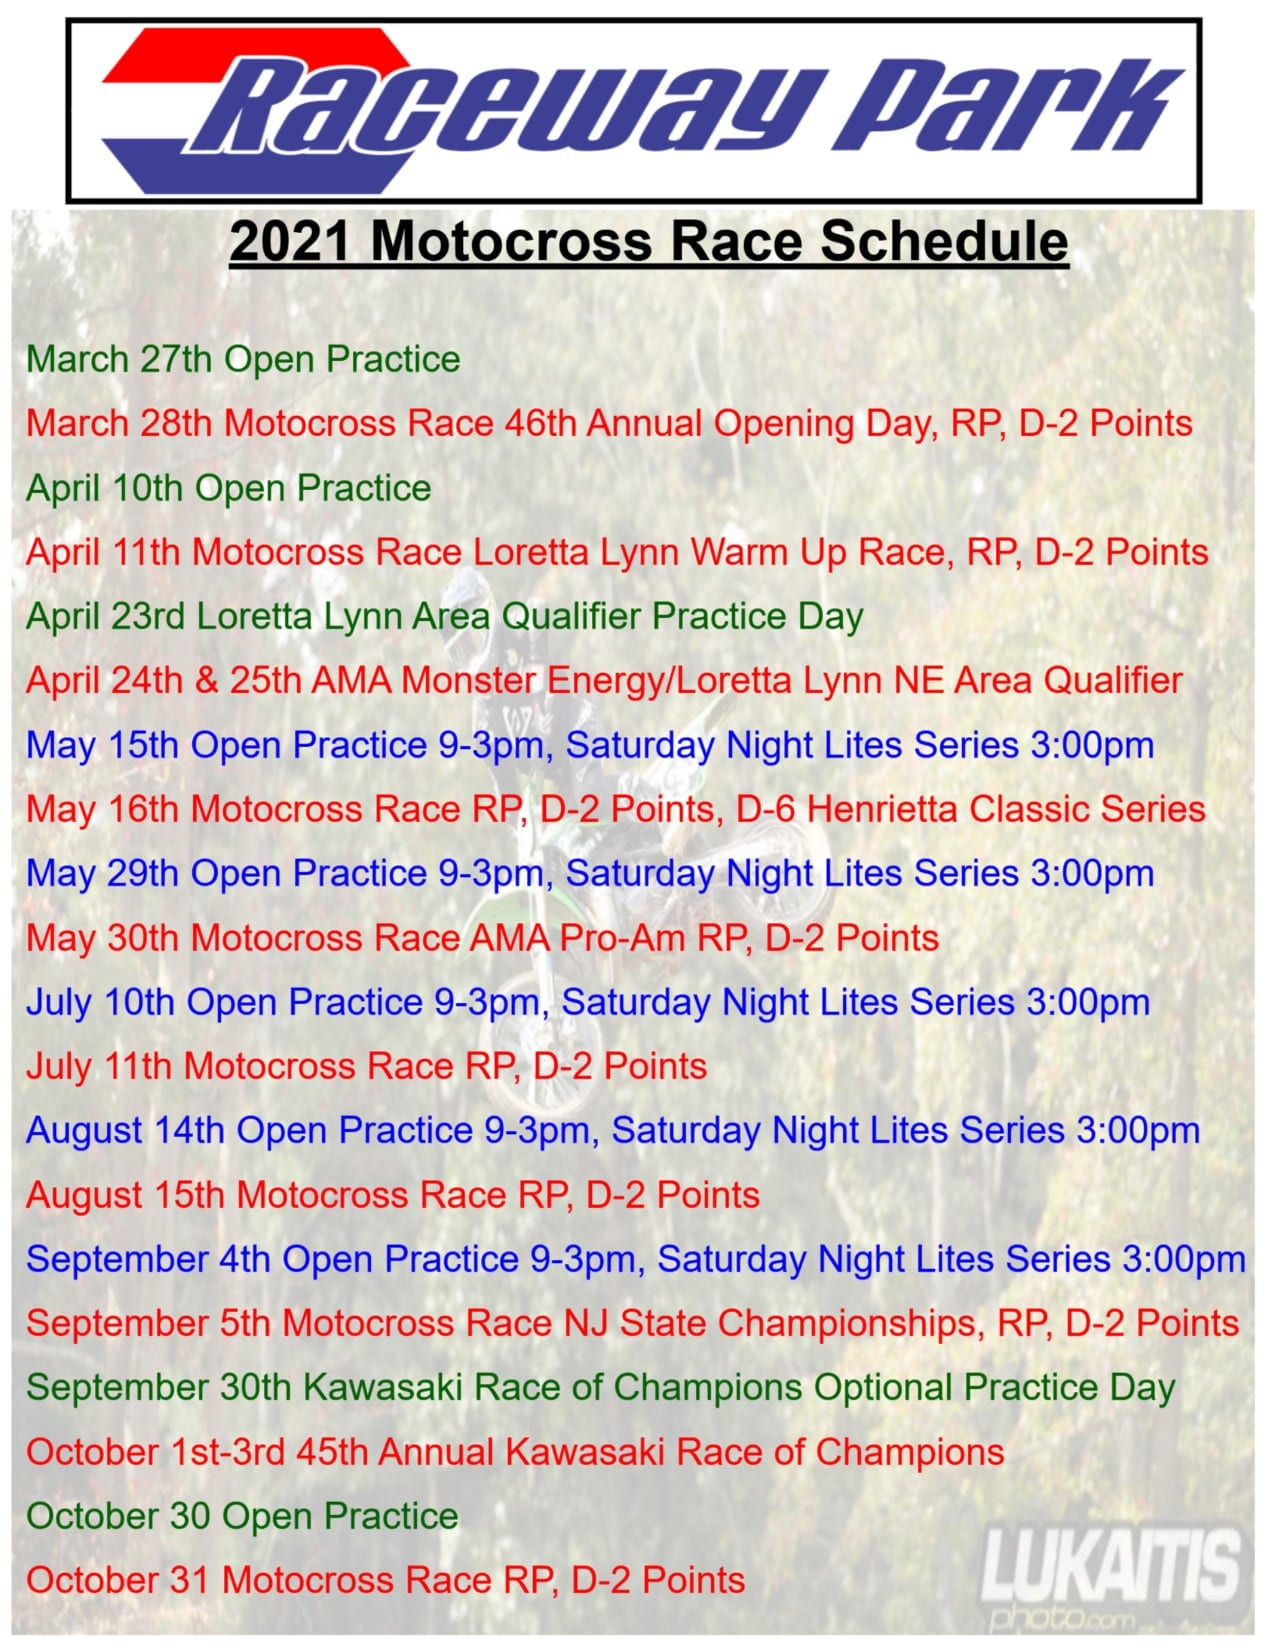 2021 Raceway Park Motocross Schedule